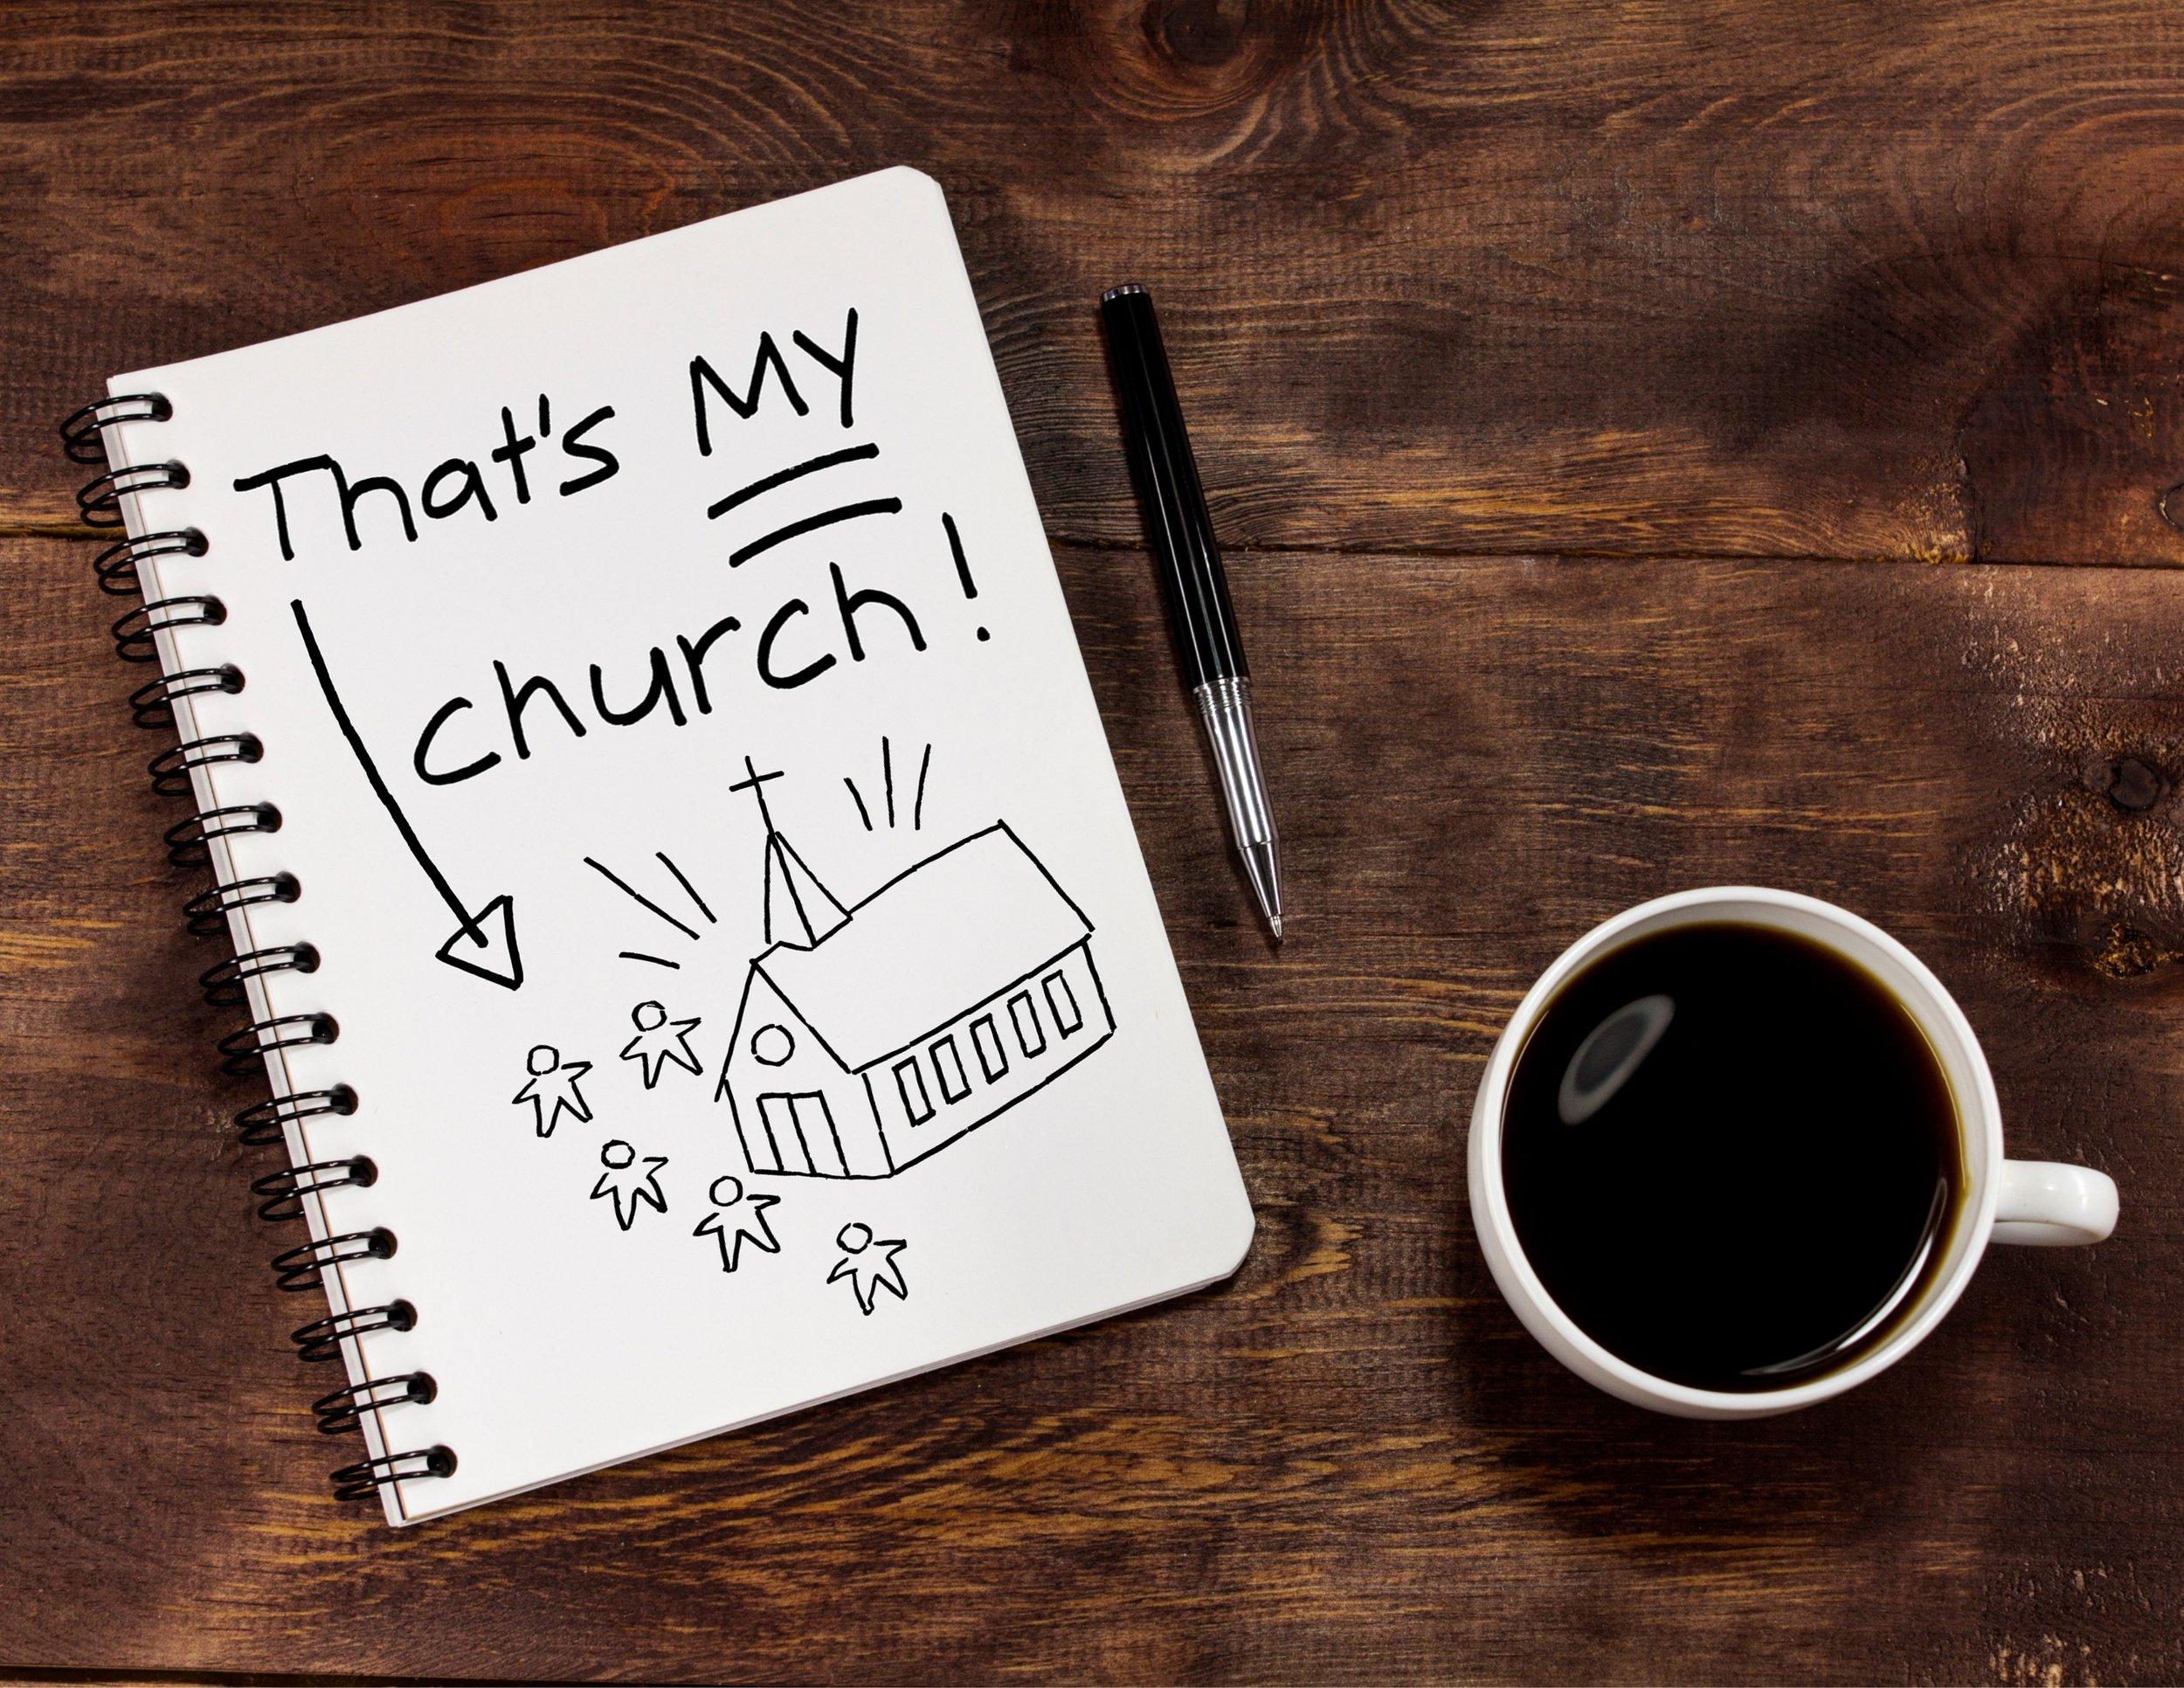 April 30, 2017 ~ A Culture of Discipleship - Part 1.2 (Mark 8:27-38) ~ Pastor Jason Pilchard